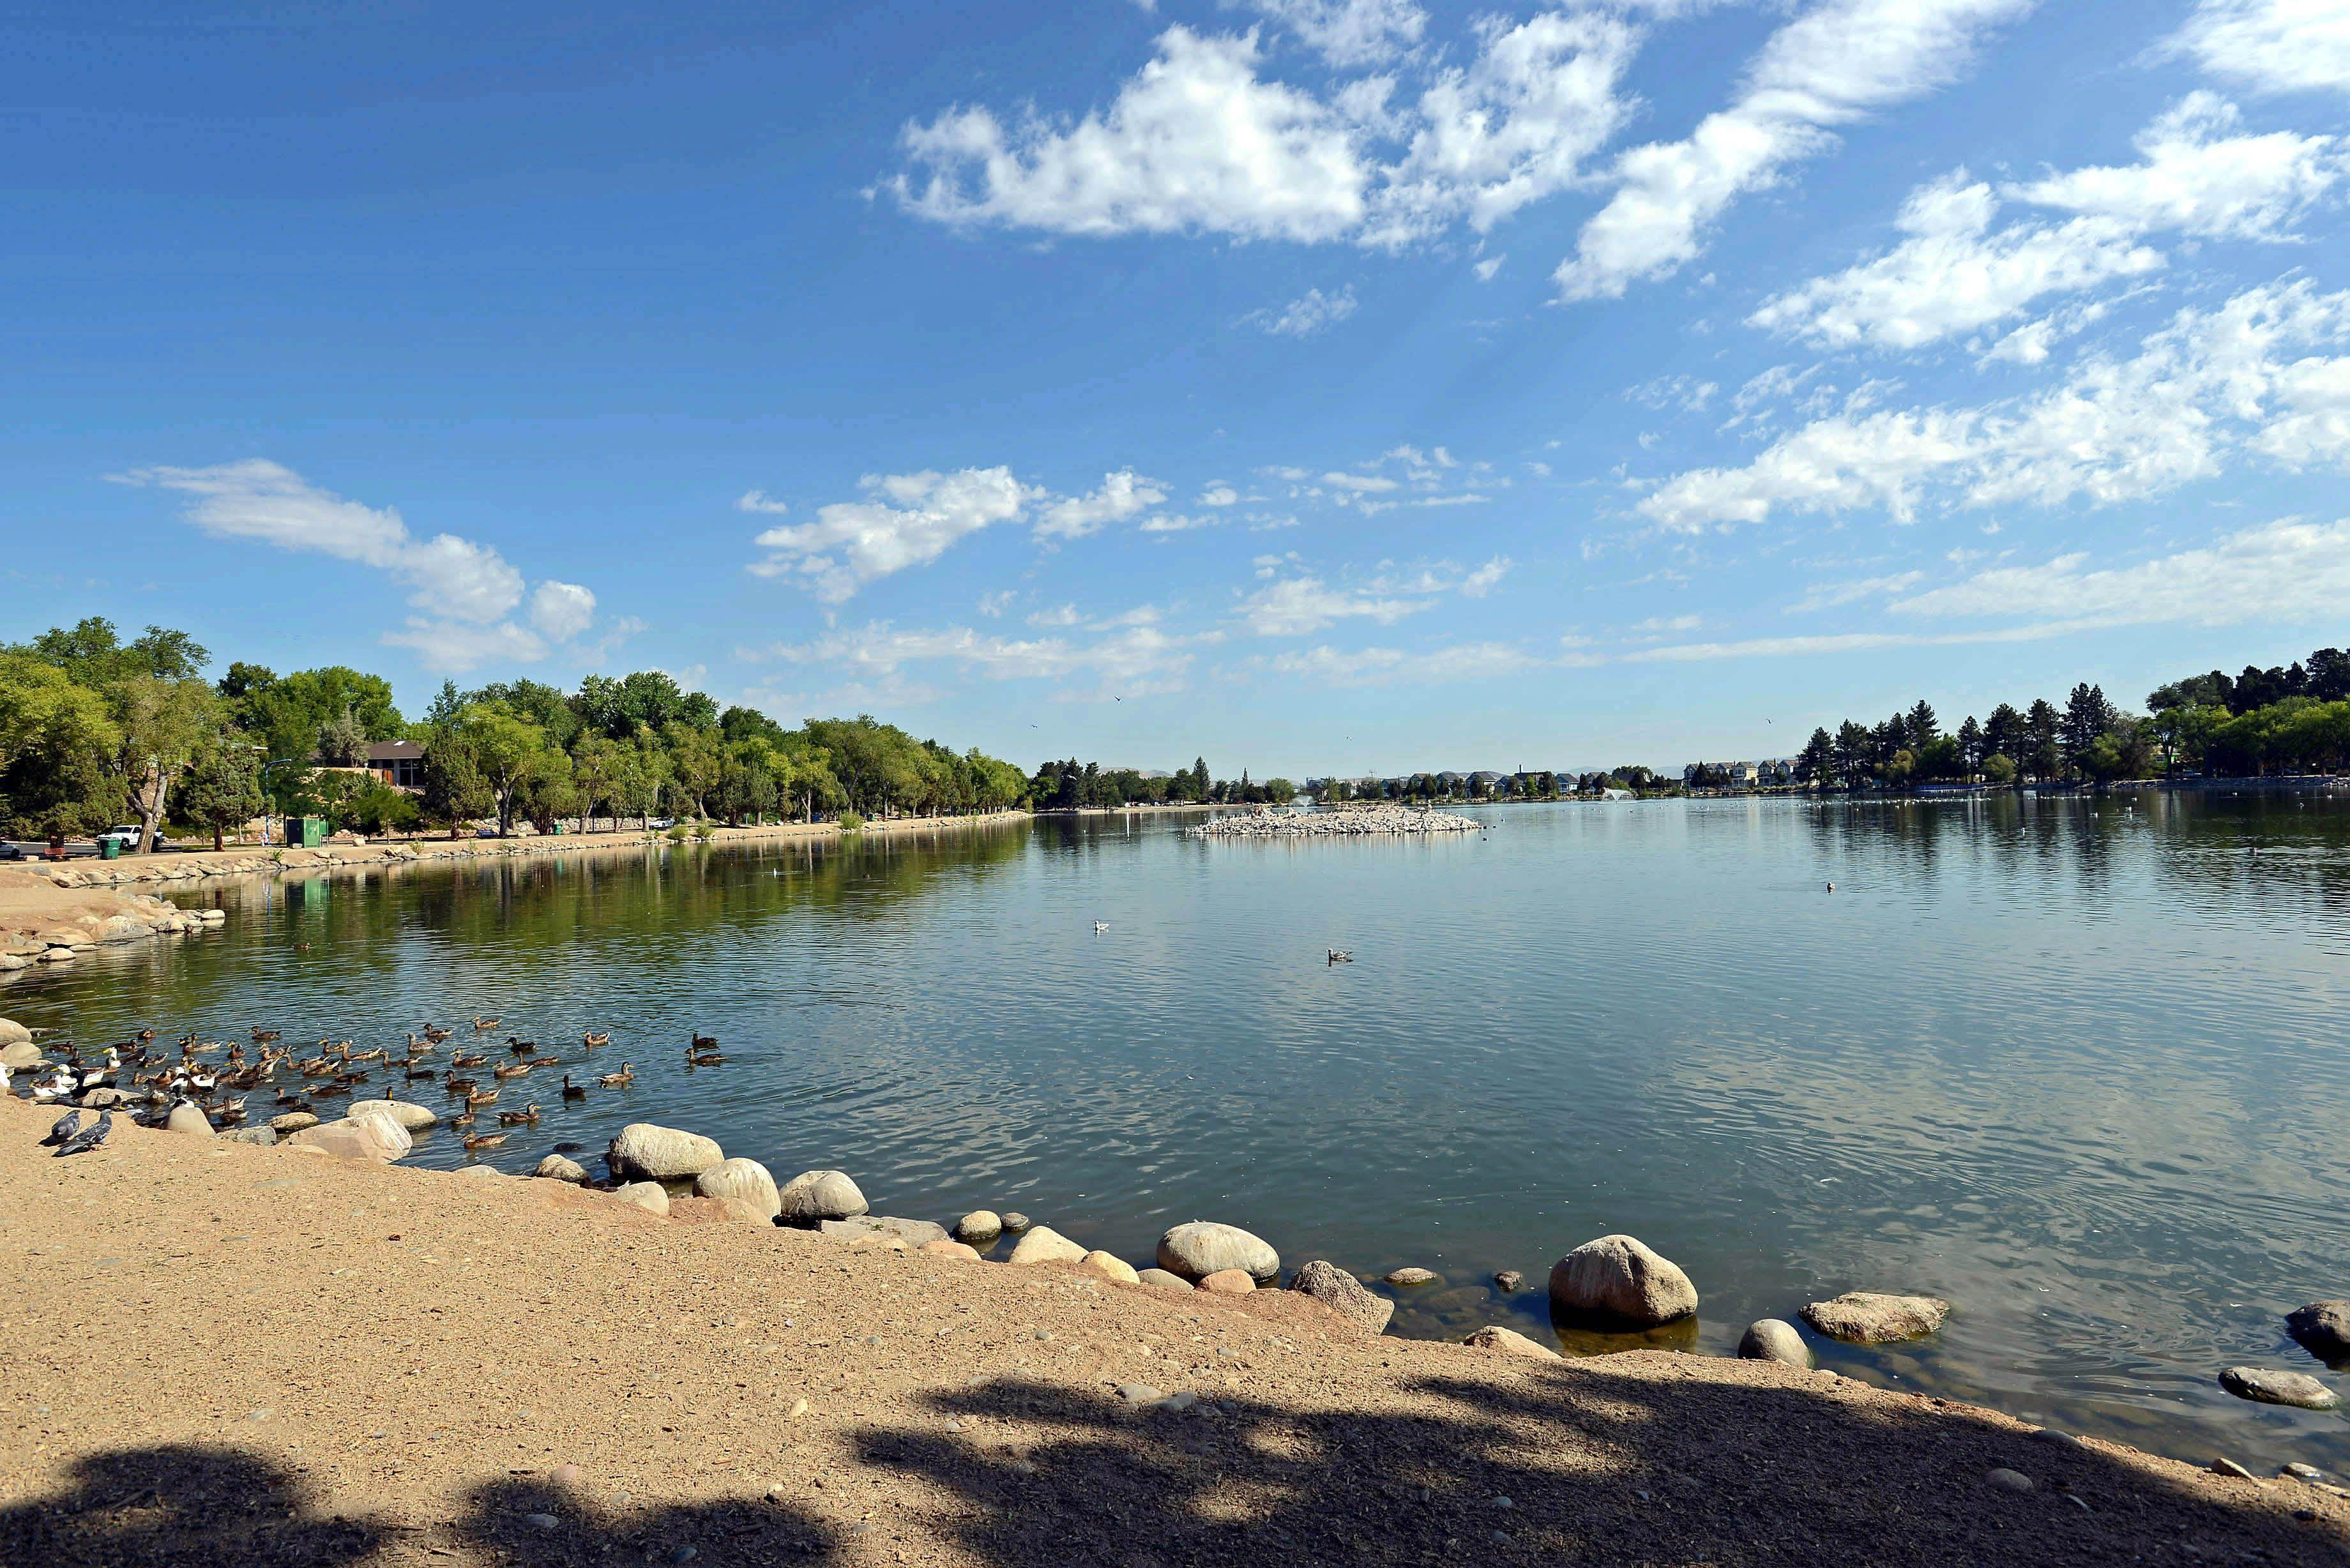 Virginia Lake Reno Beautiful Homes And Townhomes Surround The